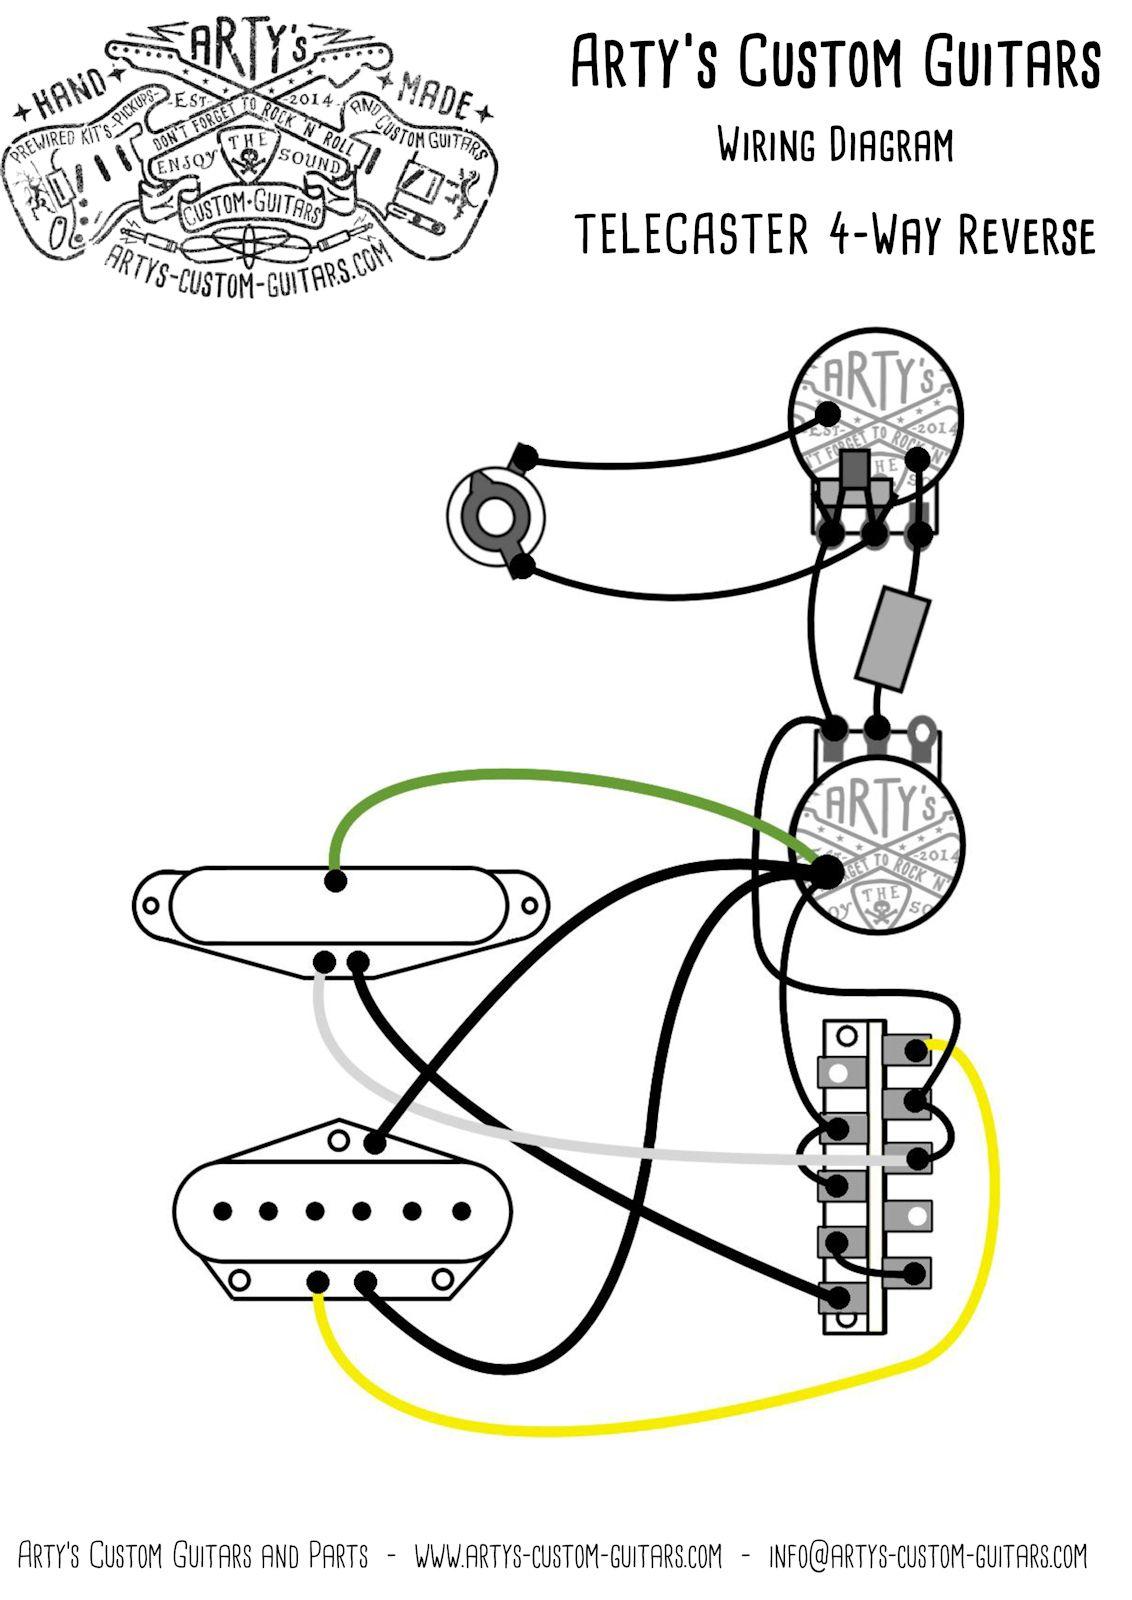 Reverse Tele Wiring Harness on tele mirrors, tele bass, tele body,